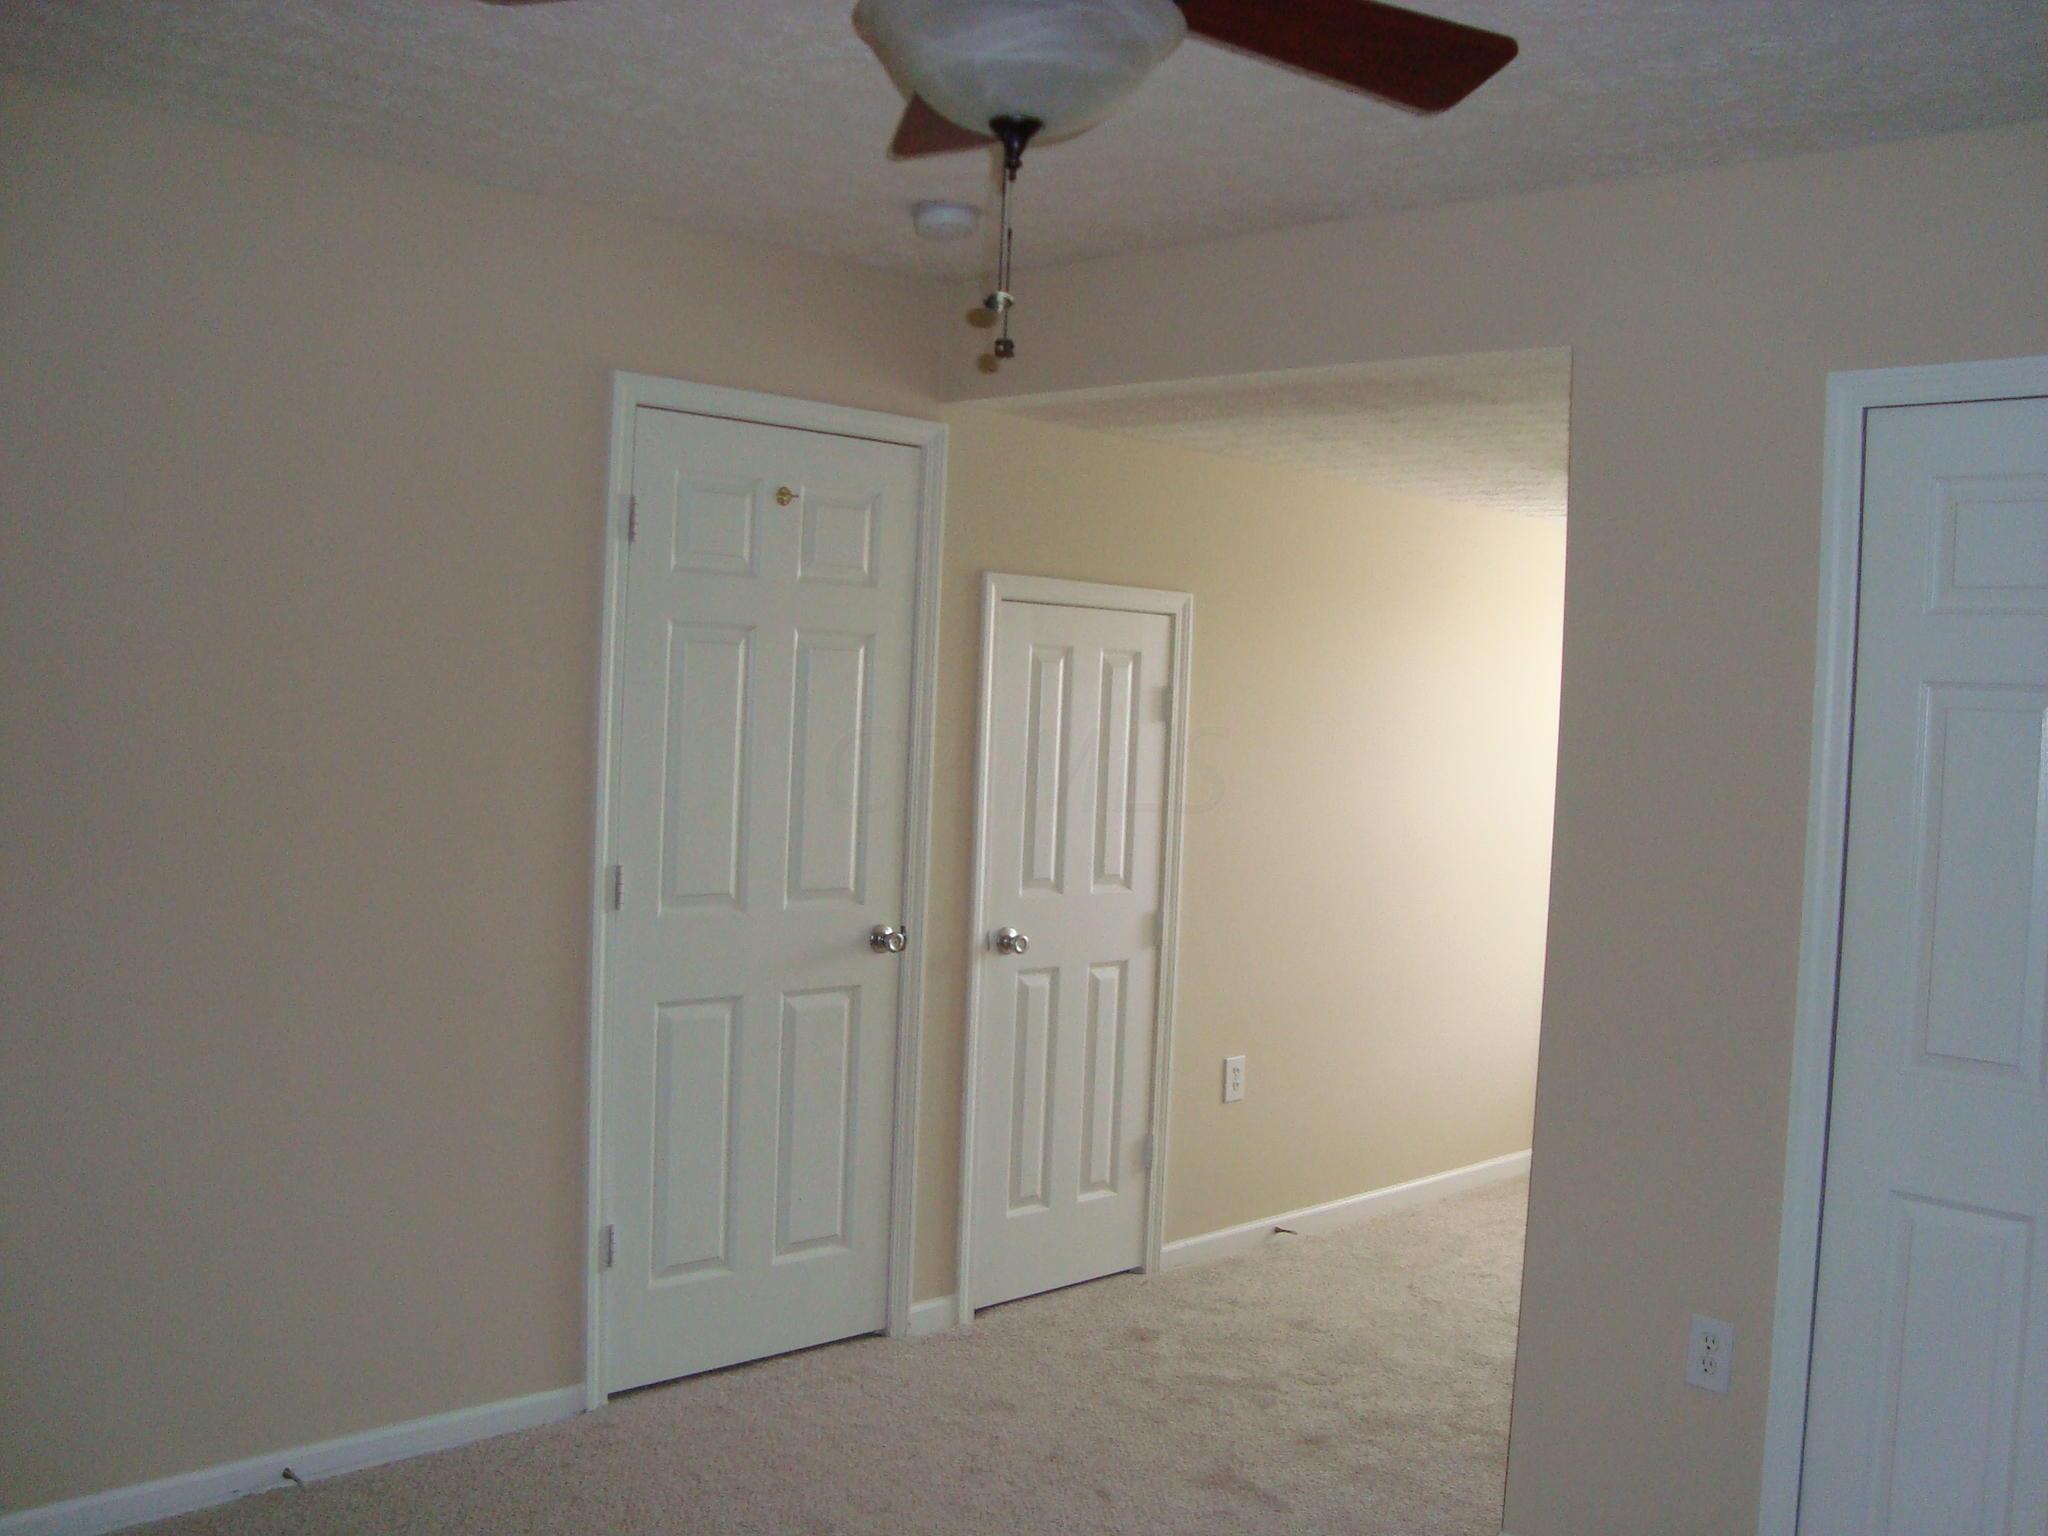 2978 Glenloch Circle, Dublin, Ohio 43017, 2 Bedrooms Bedrooms, ,2 BathroomsBathrooms,Residential,For Sale,Glenloch,220016398